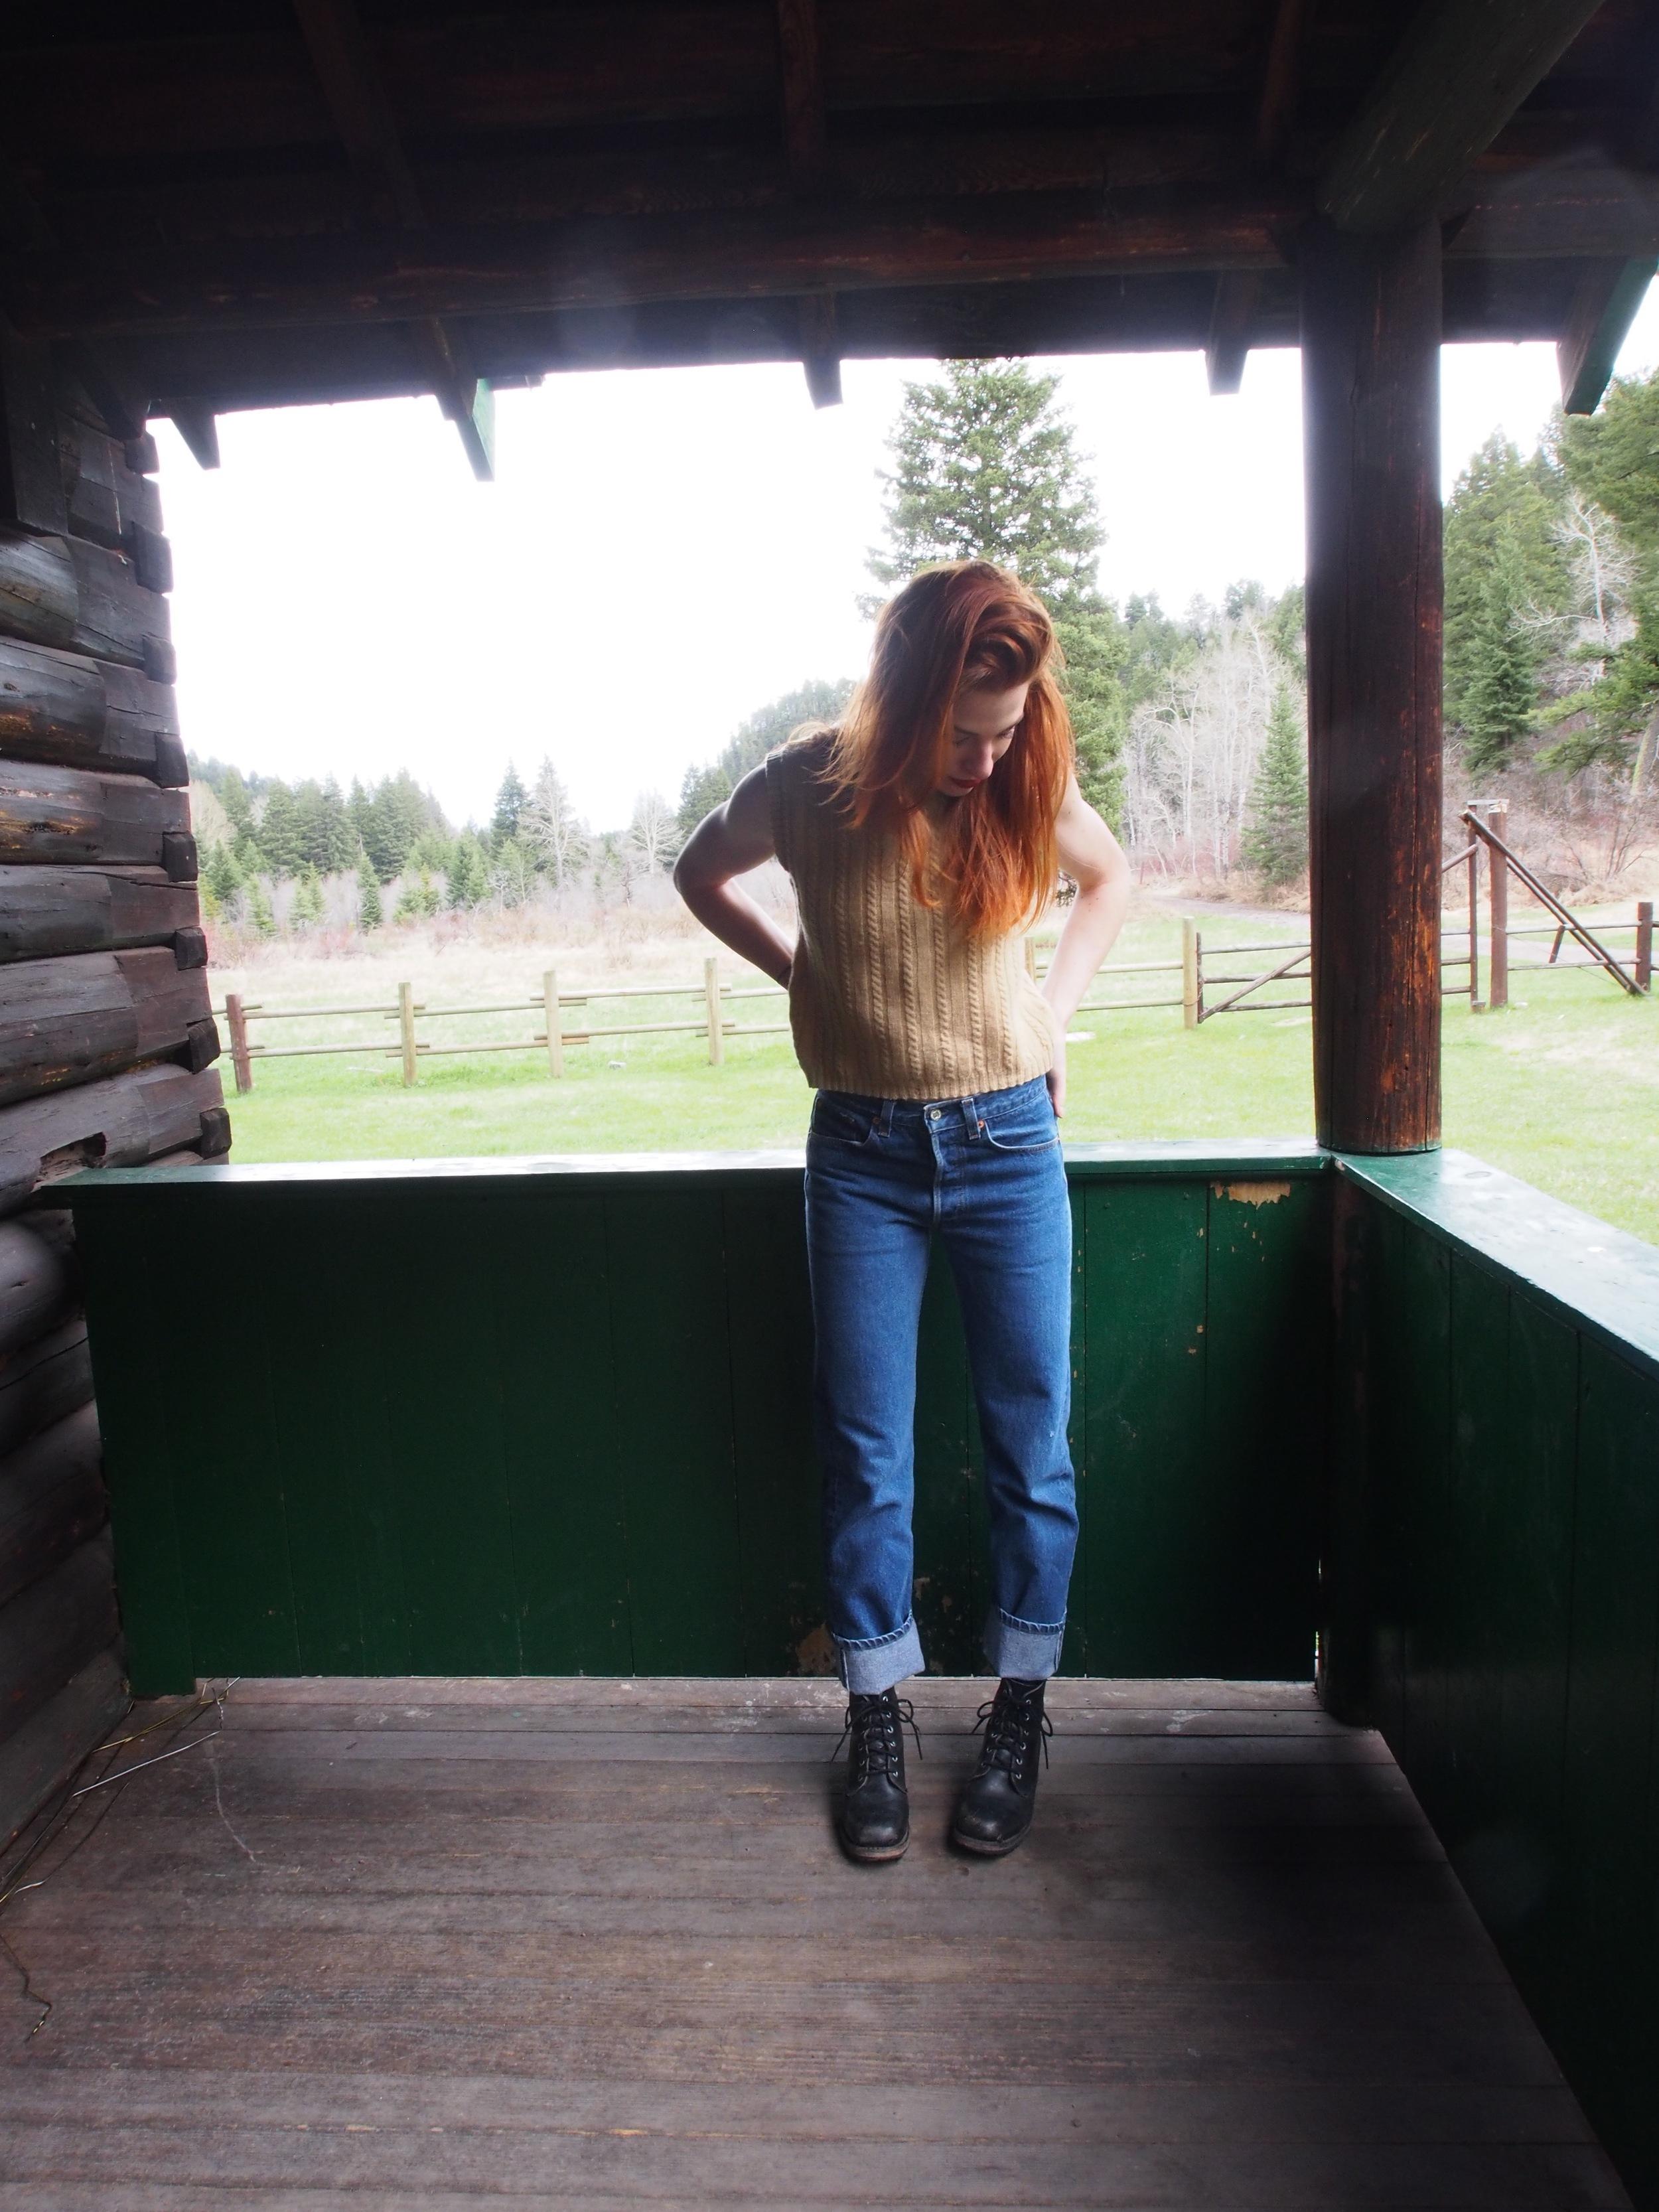 vintage Levis 501 jeans - coming soon